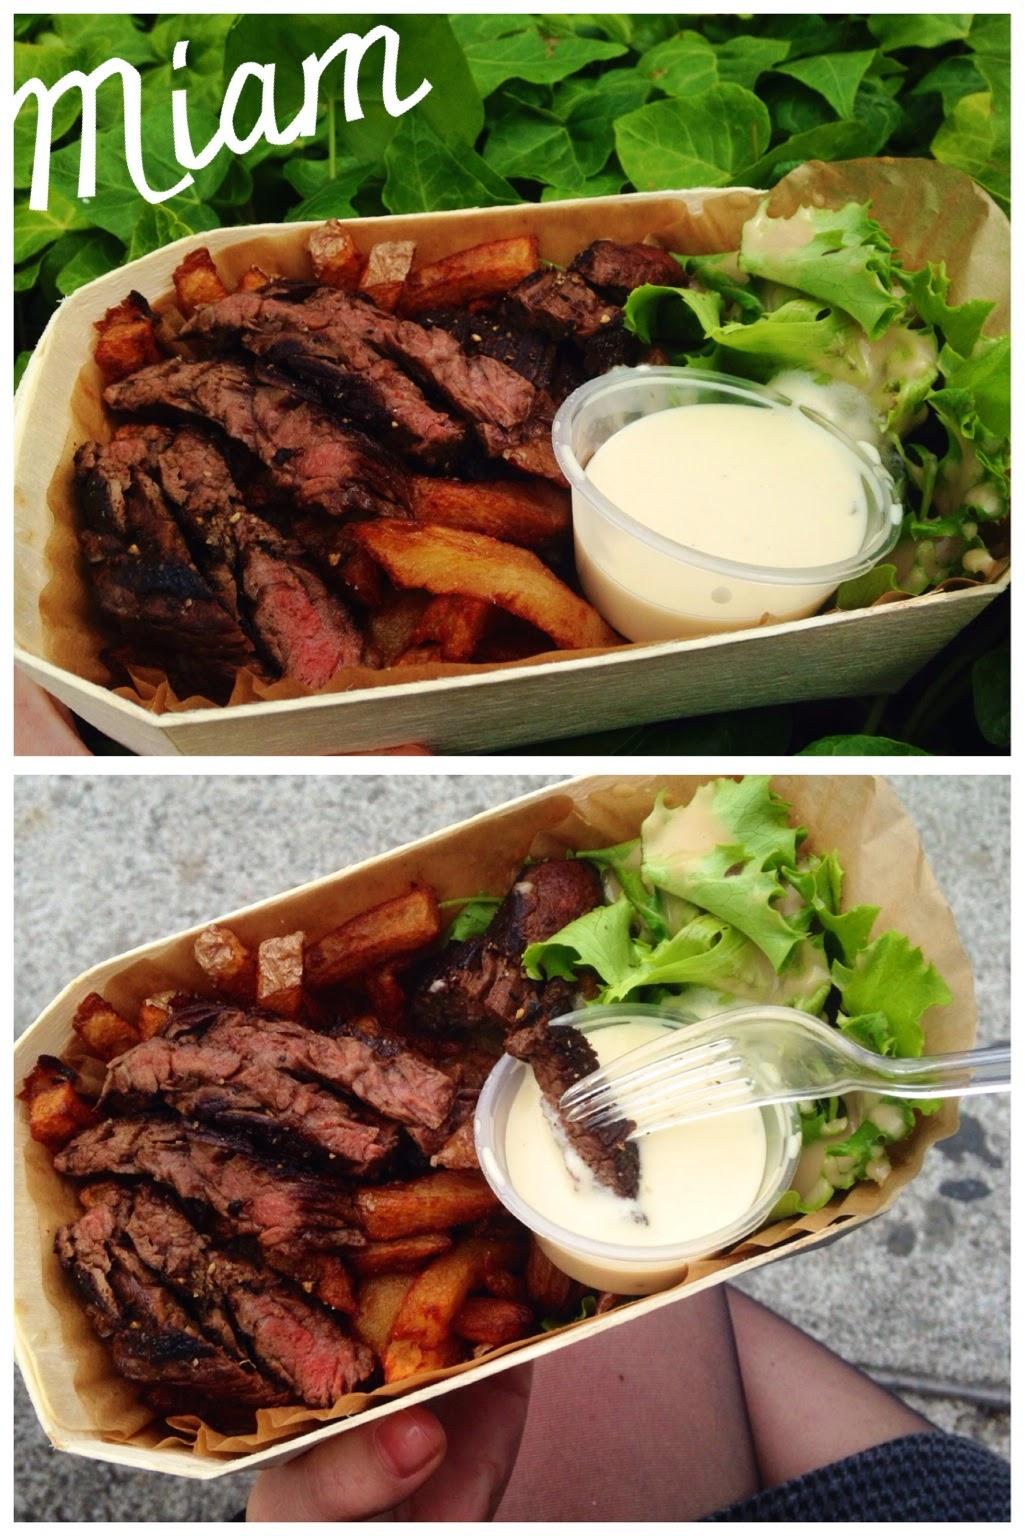 La Brigade Food Truck Paris Miam Home Made Fait Maison